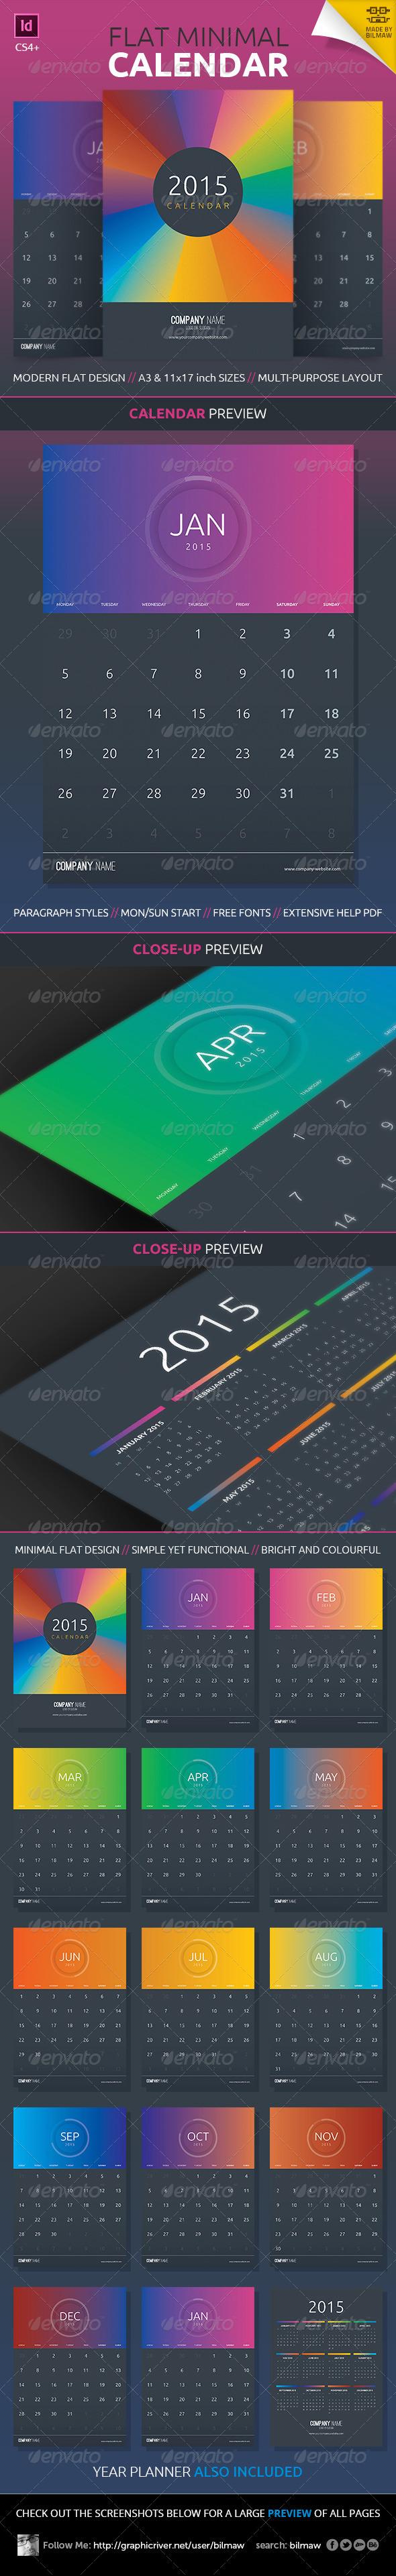 Flat Minimal Calendar - Calendars Stationery